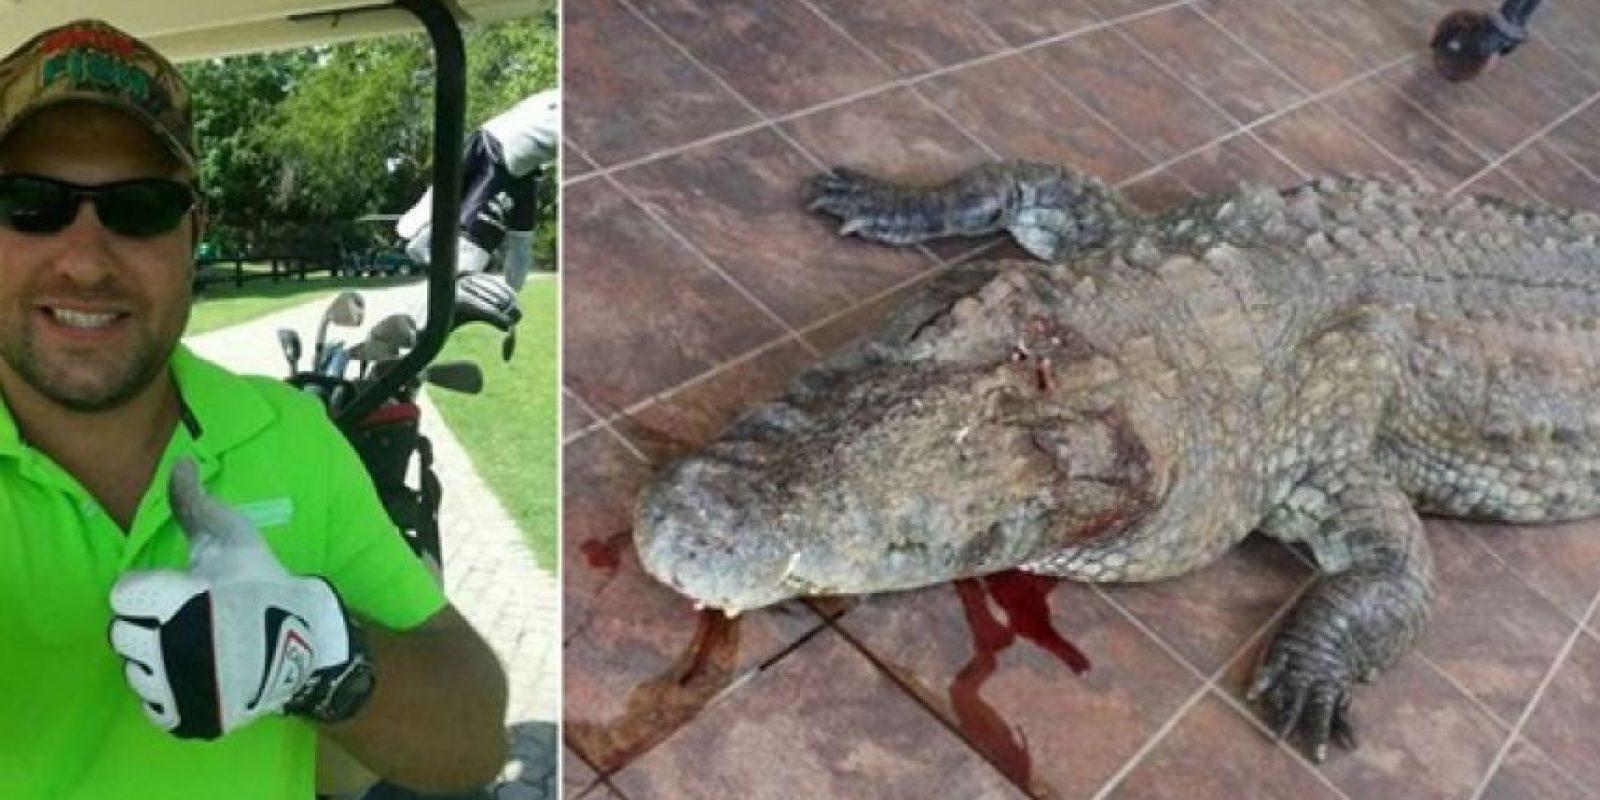 La guardia le dio muerte al cocodrilo que mató a Jacques van der Sandt. Foto:Agencias